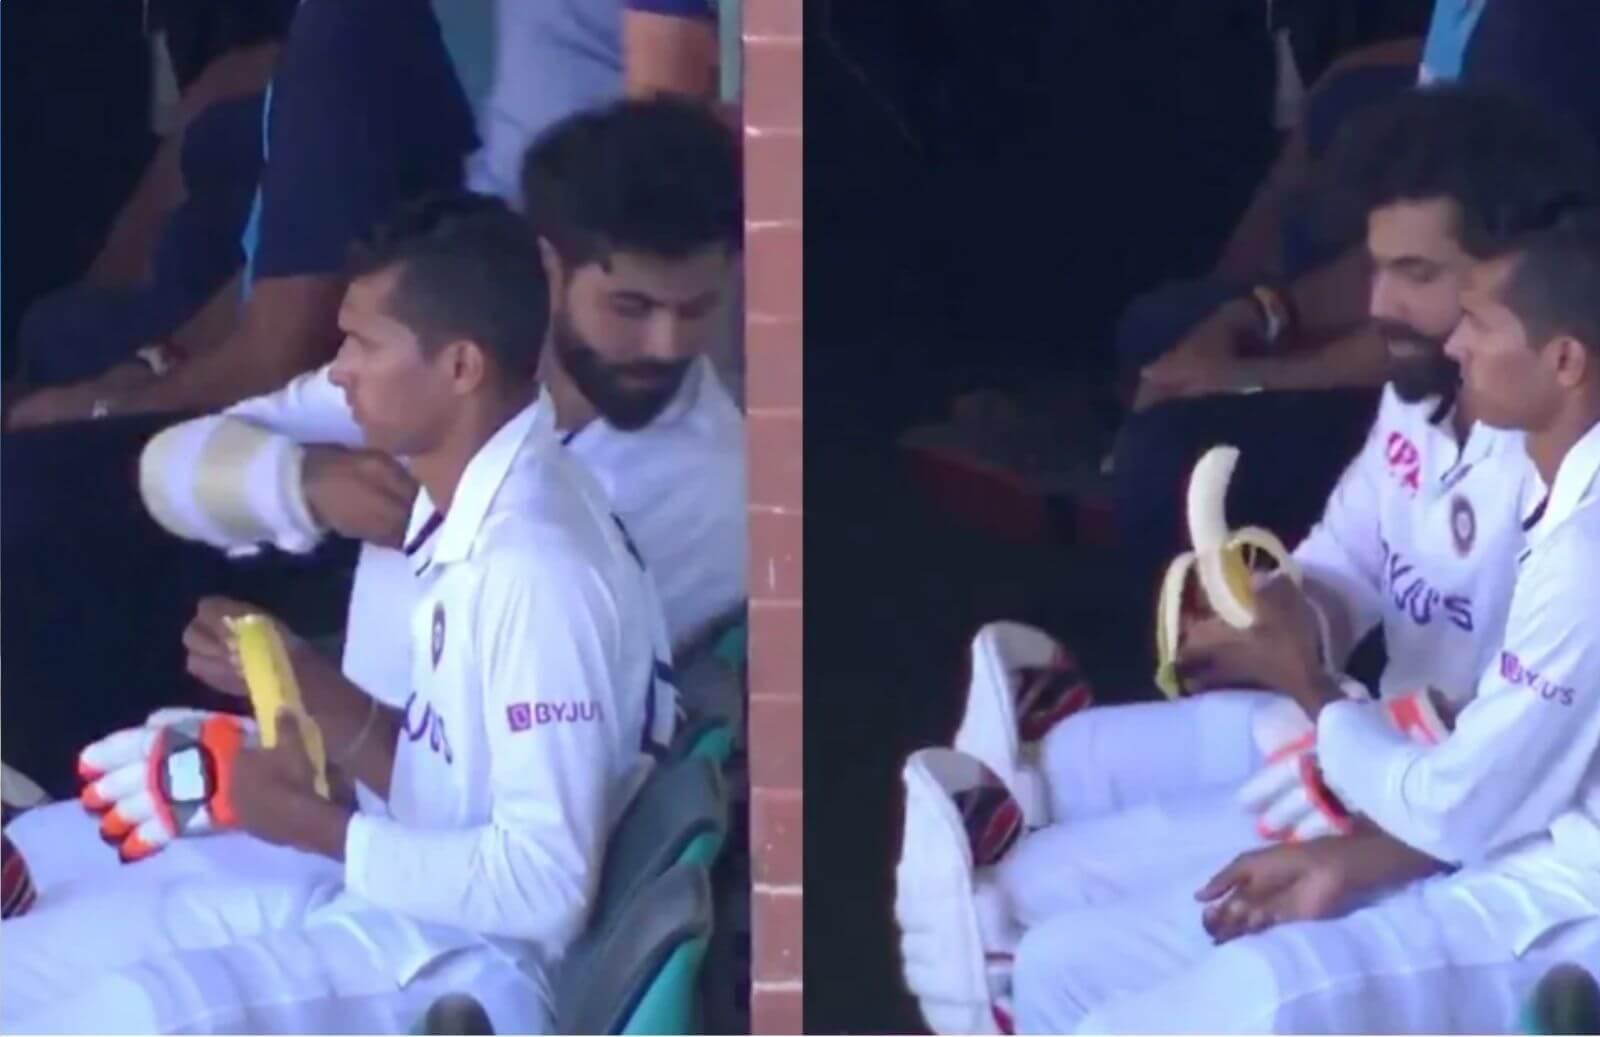 WATCH_ Cute Video Clip Gets Viral. Navdeep Saini Peeling Banana For Ravindra Jadeja